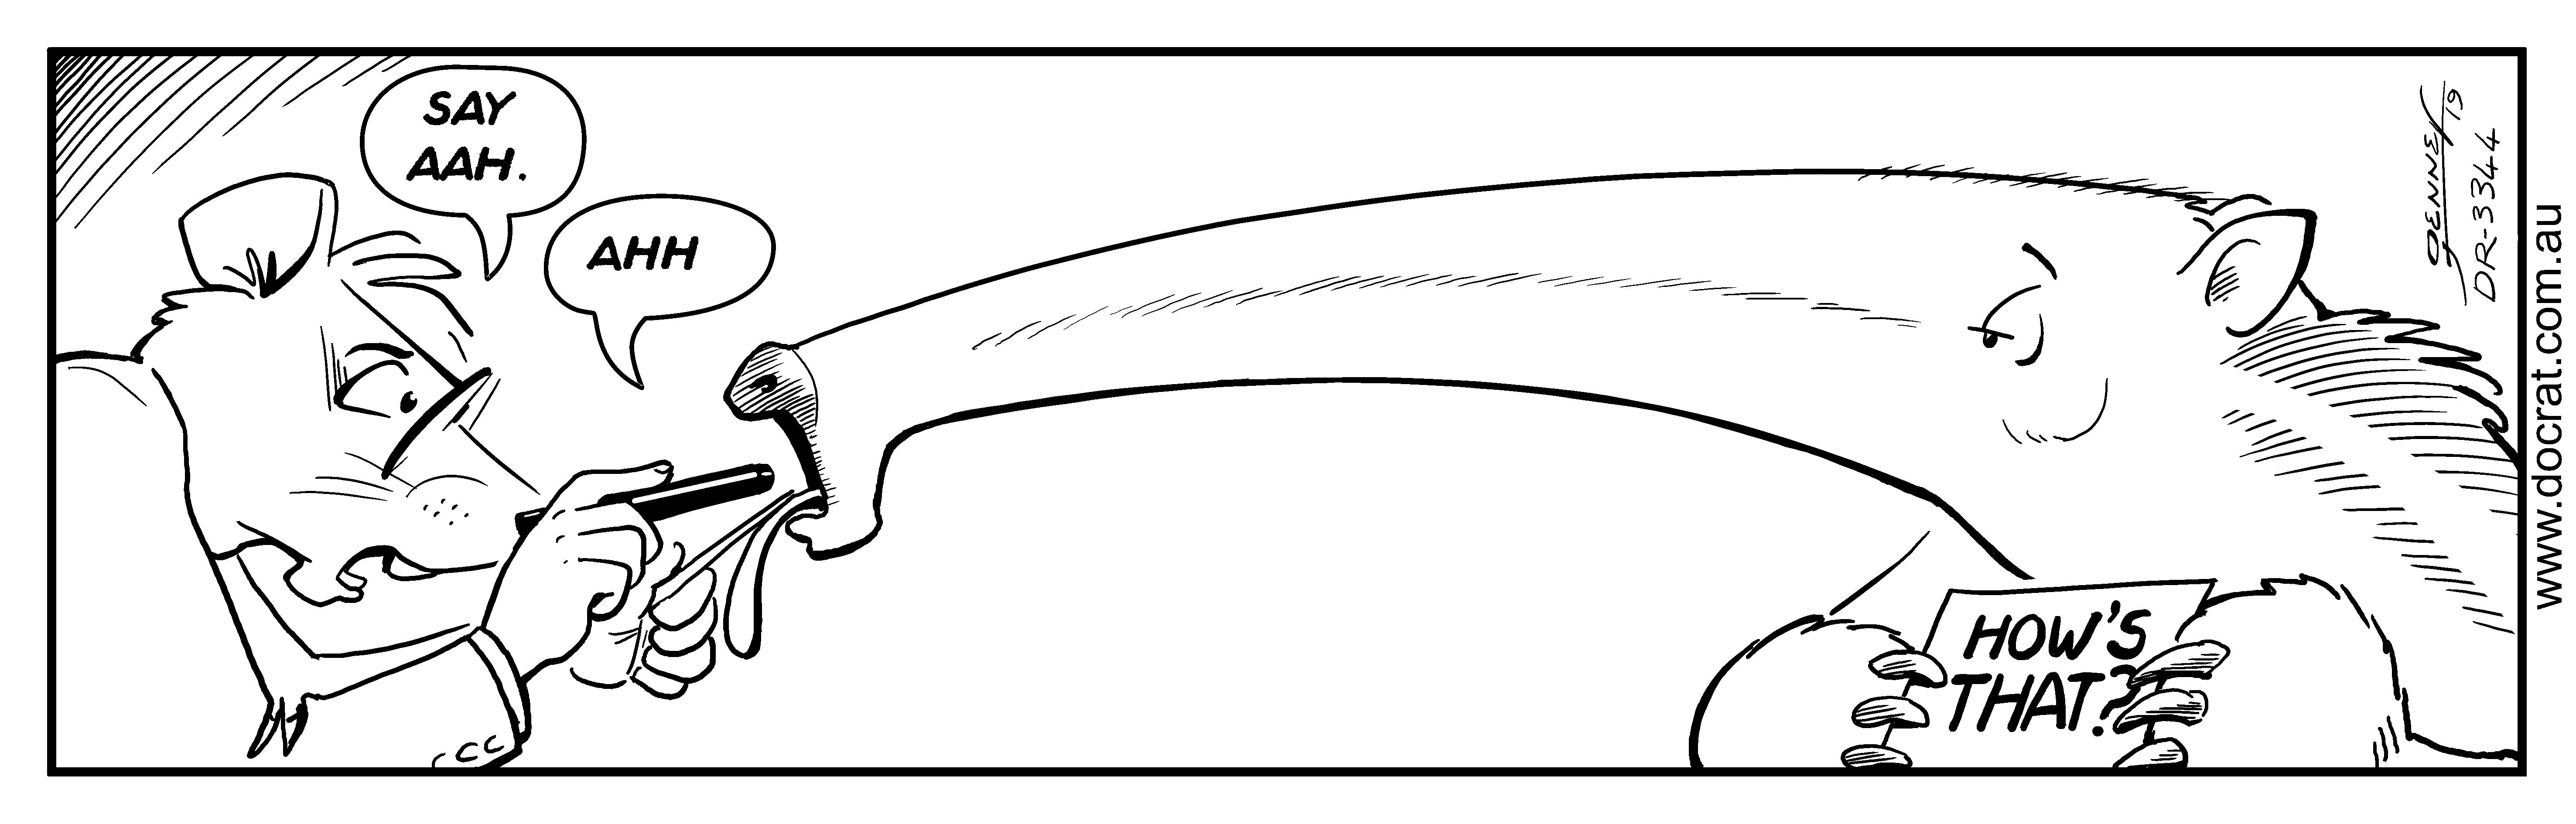 20191003